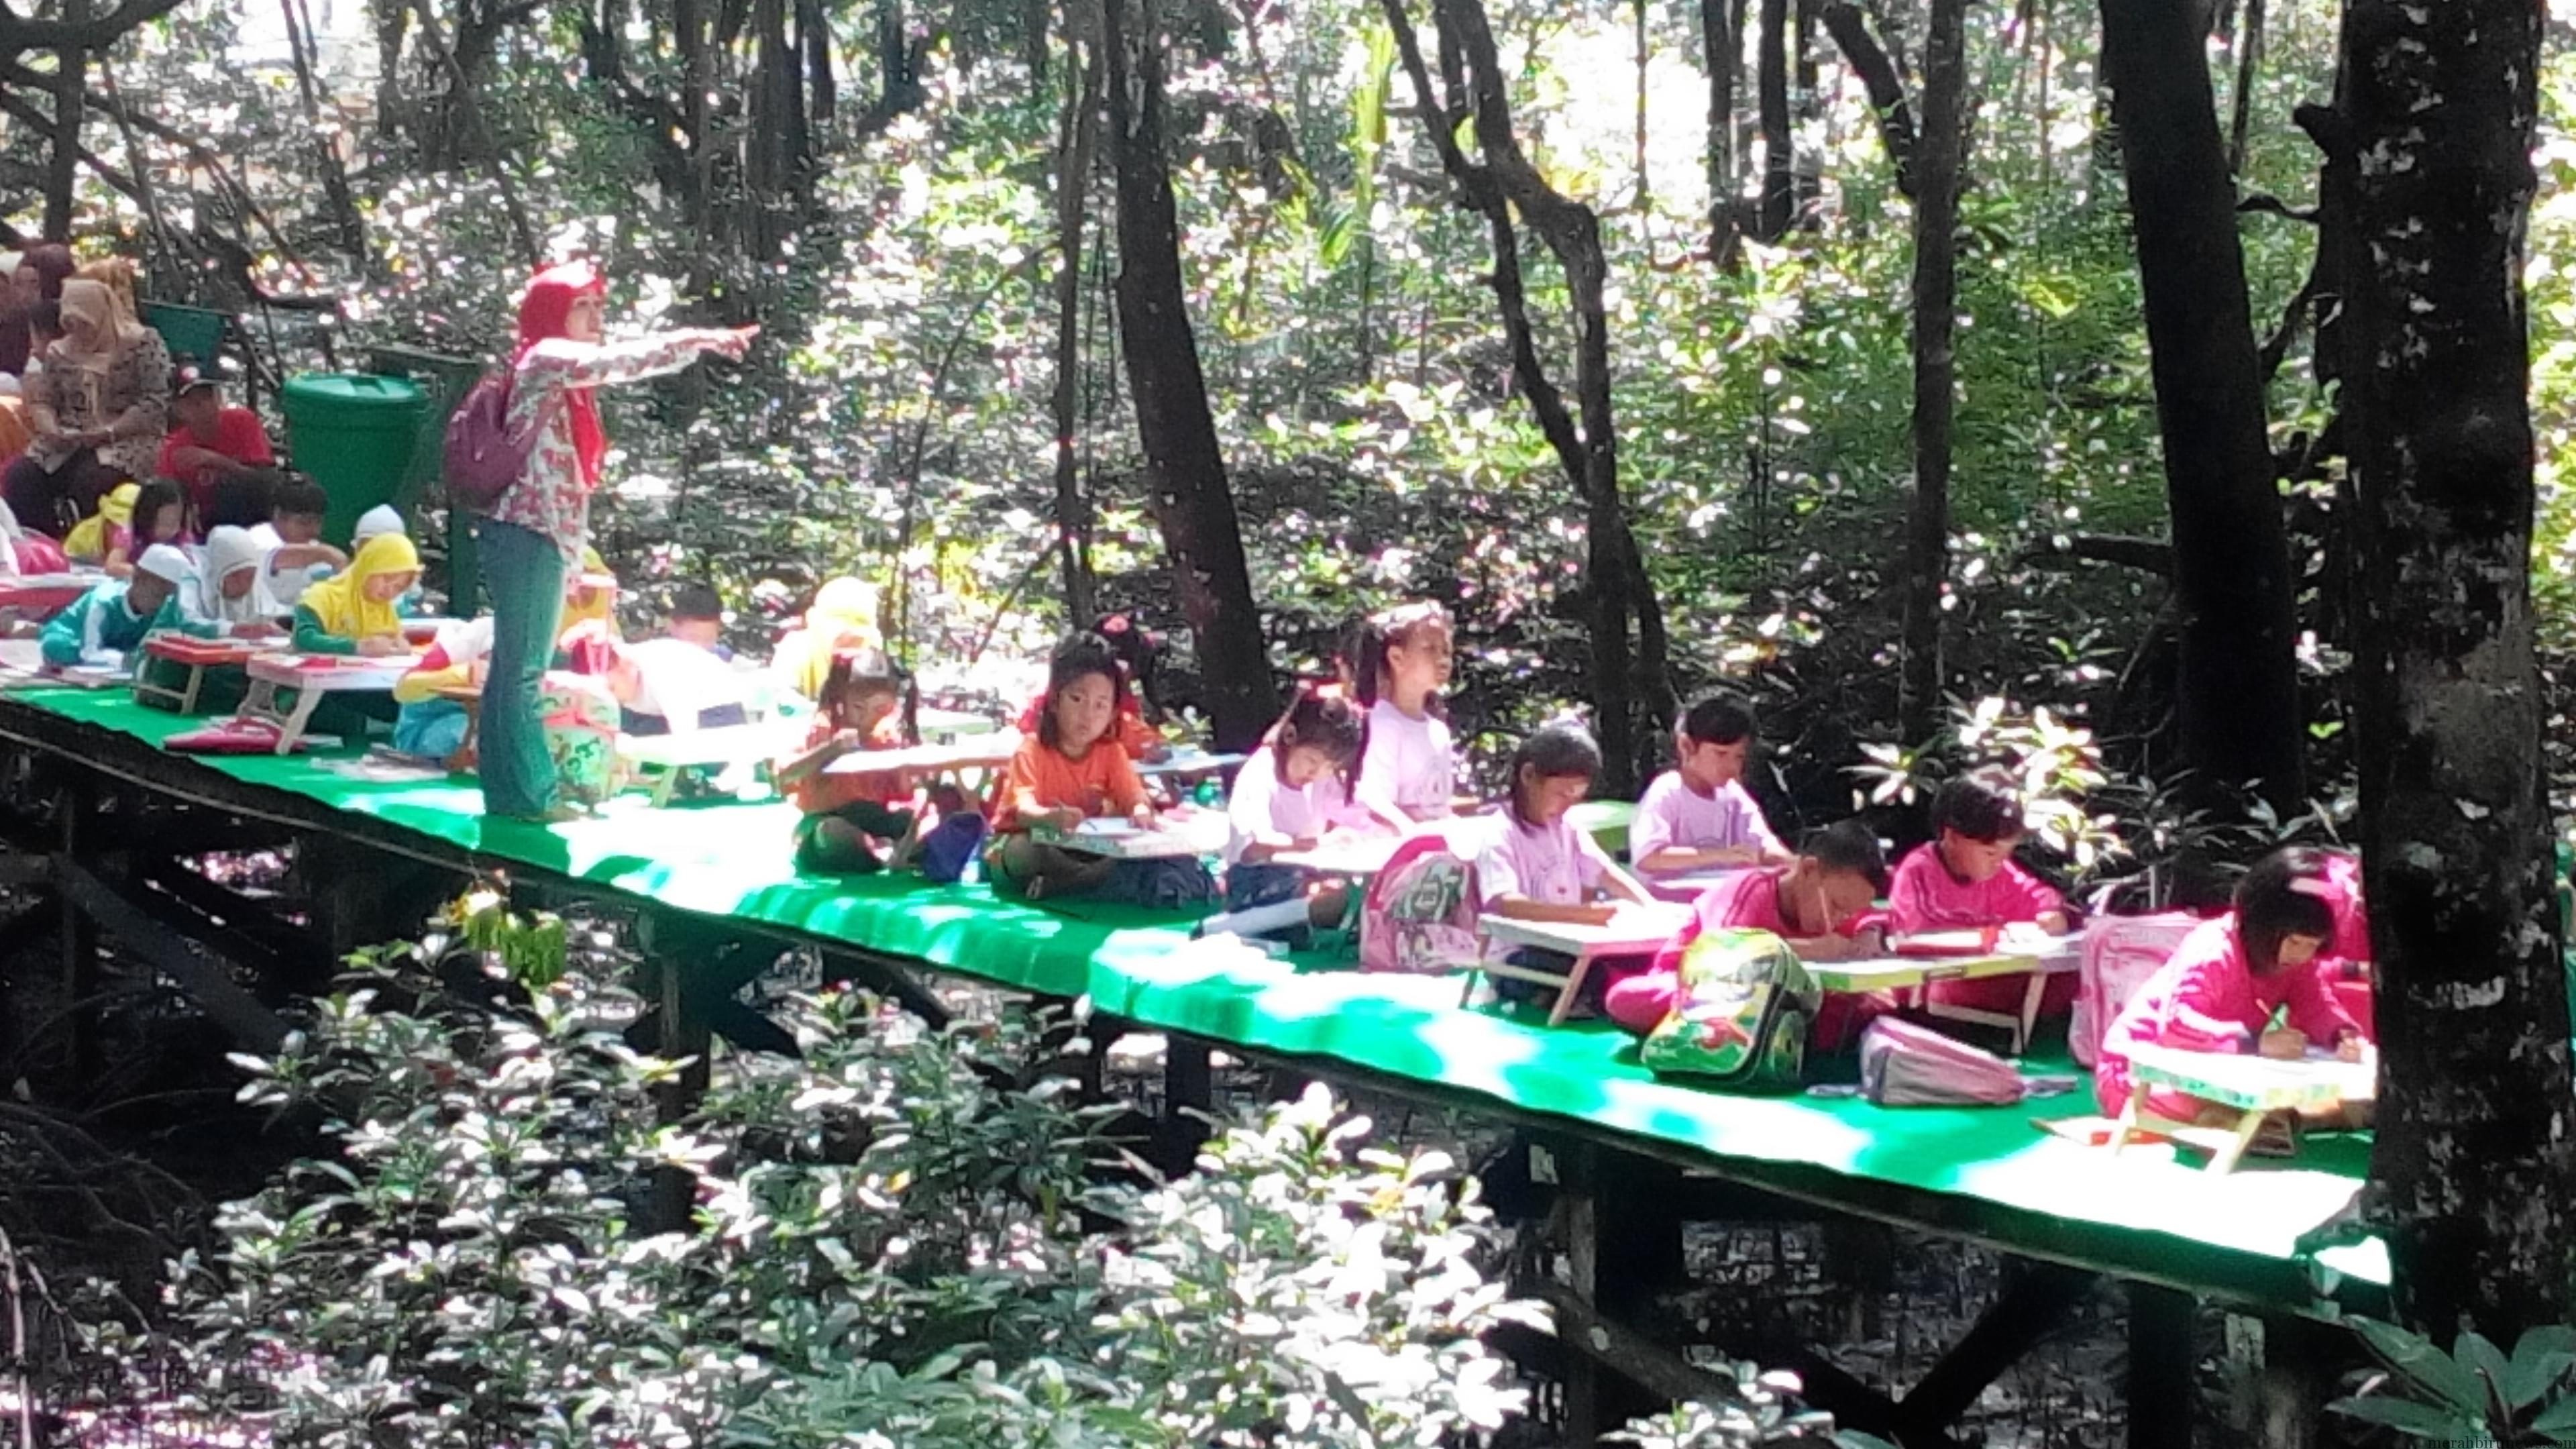 Anak anak kecil nan lucu dan imut dari berbagai TK tengah mengikuti lomba mewarnai yang diselenggaran